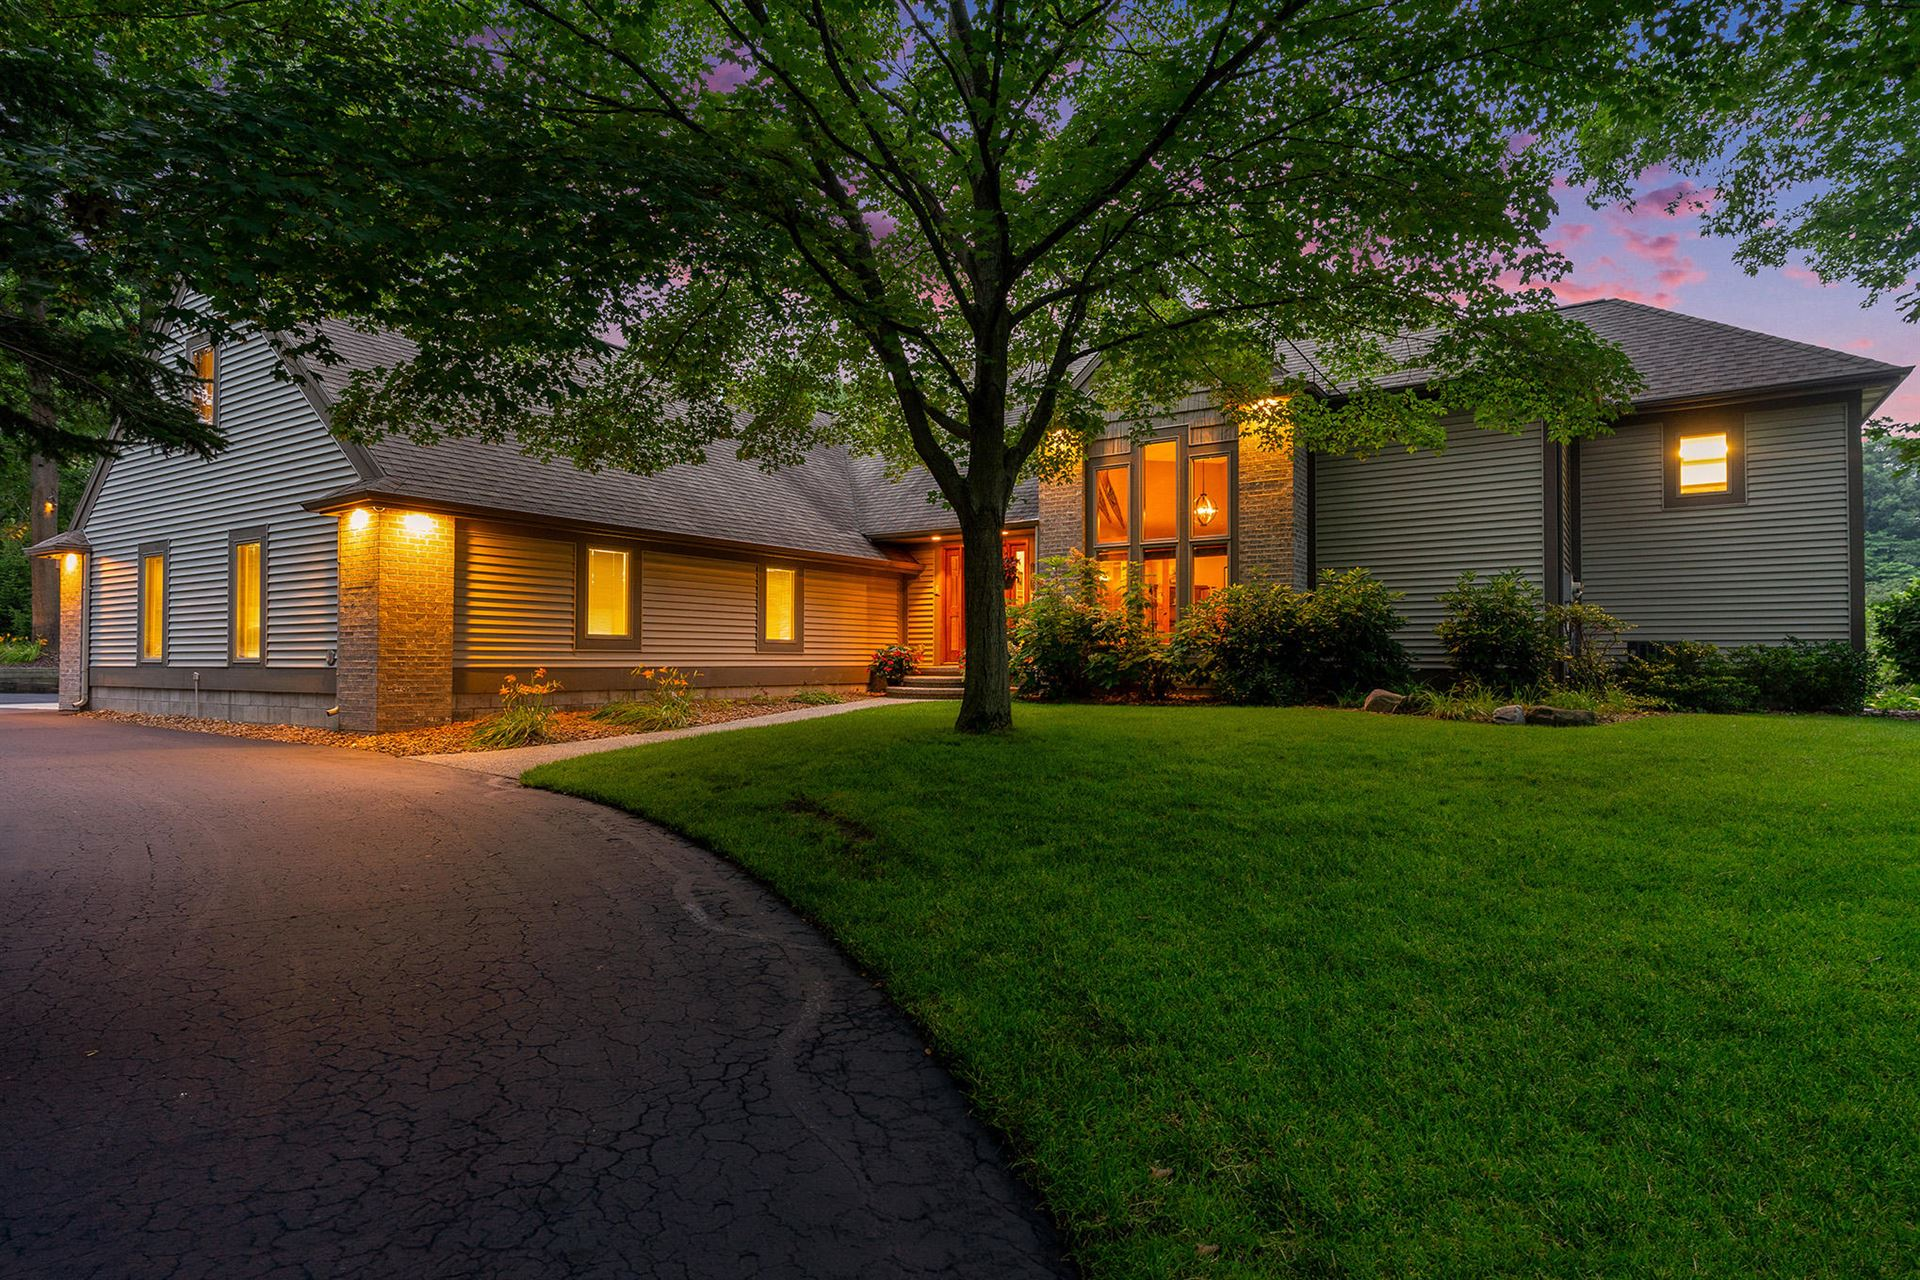 Photo of 16505 & 0 152nd Avenue, Spring Lake, MI 49456 (MLS # 21033993)